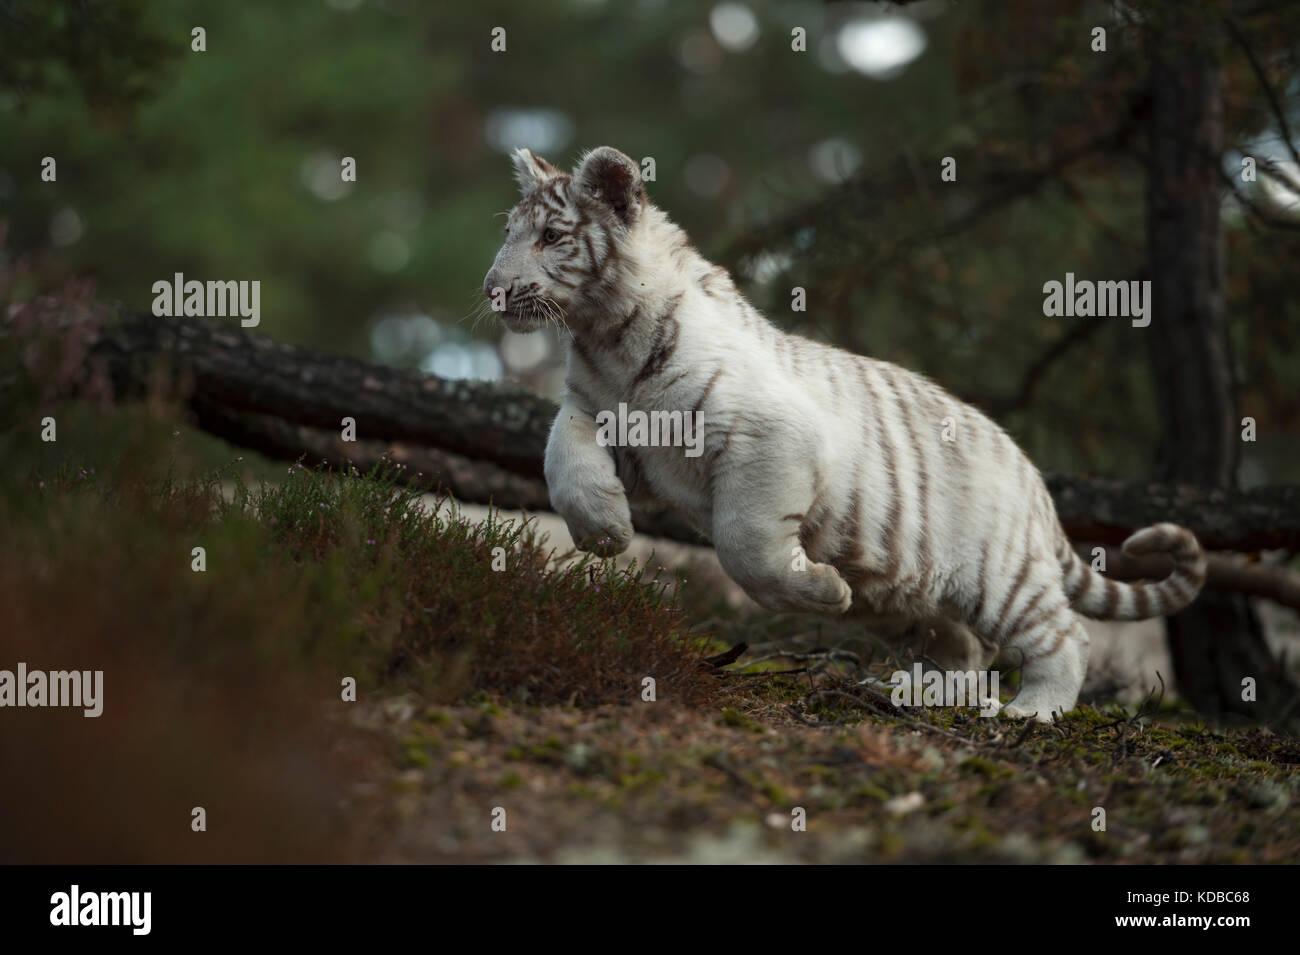 Royal Bengal Tiger / Koenigstiger ( Panthera tigris ), white morph, jumping through the scrub of a natural forest, - Stock Image